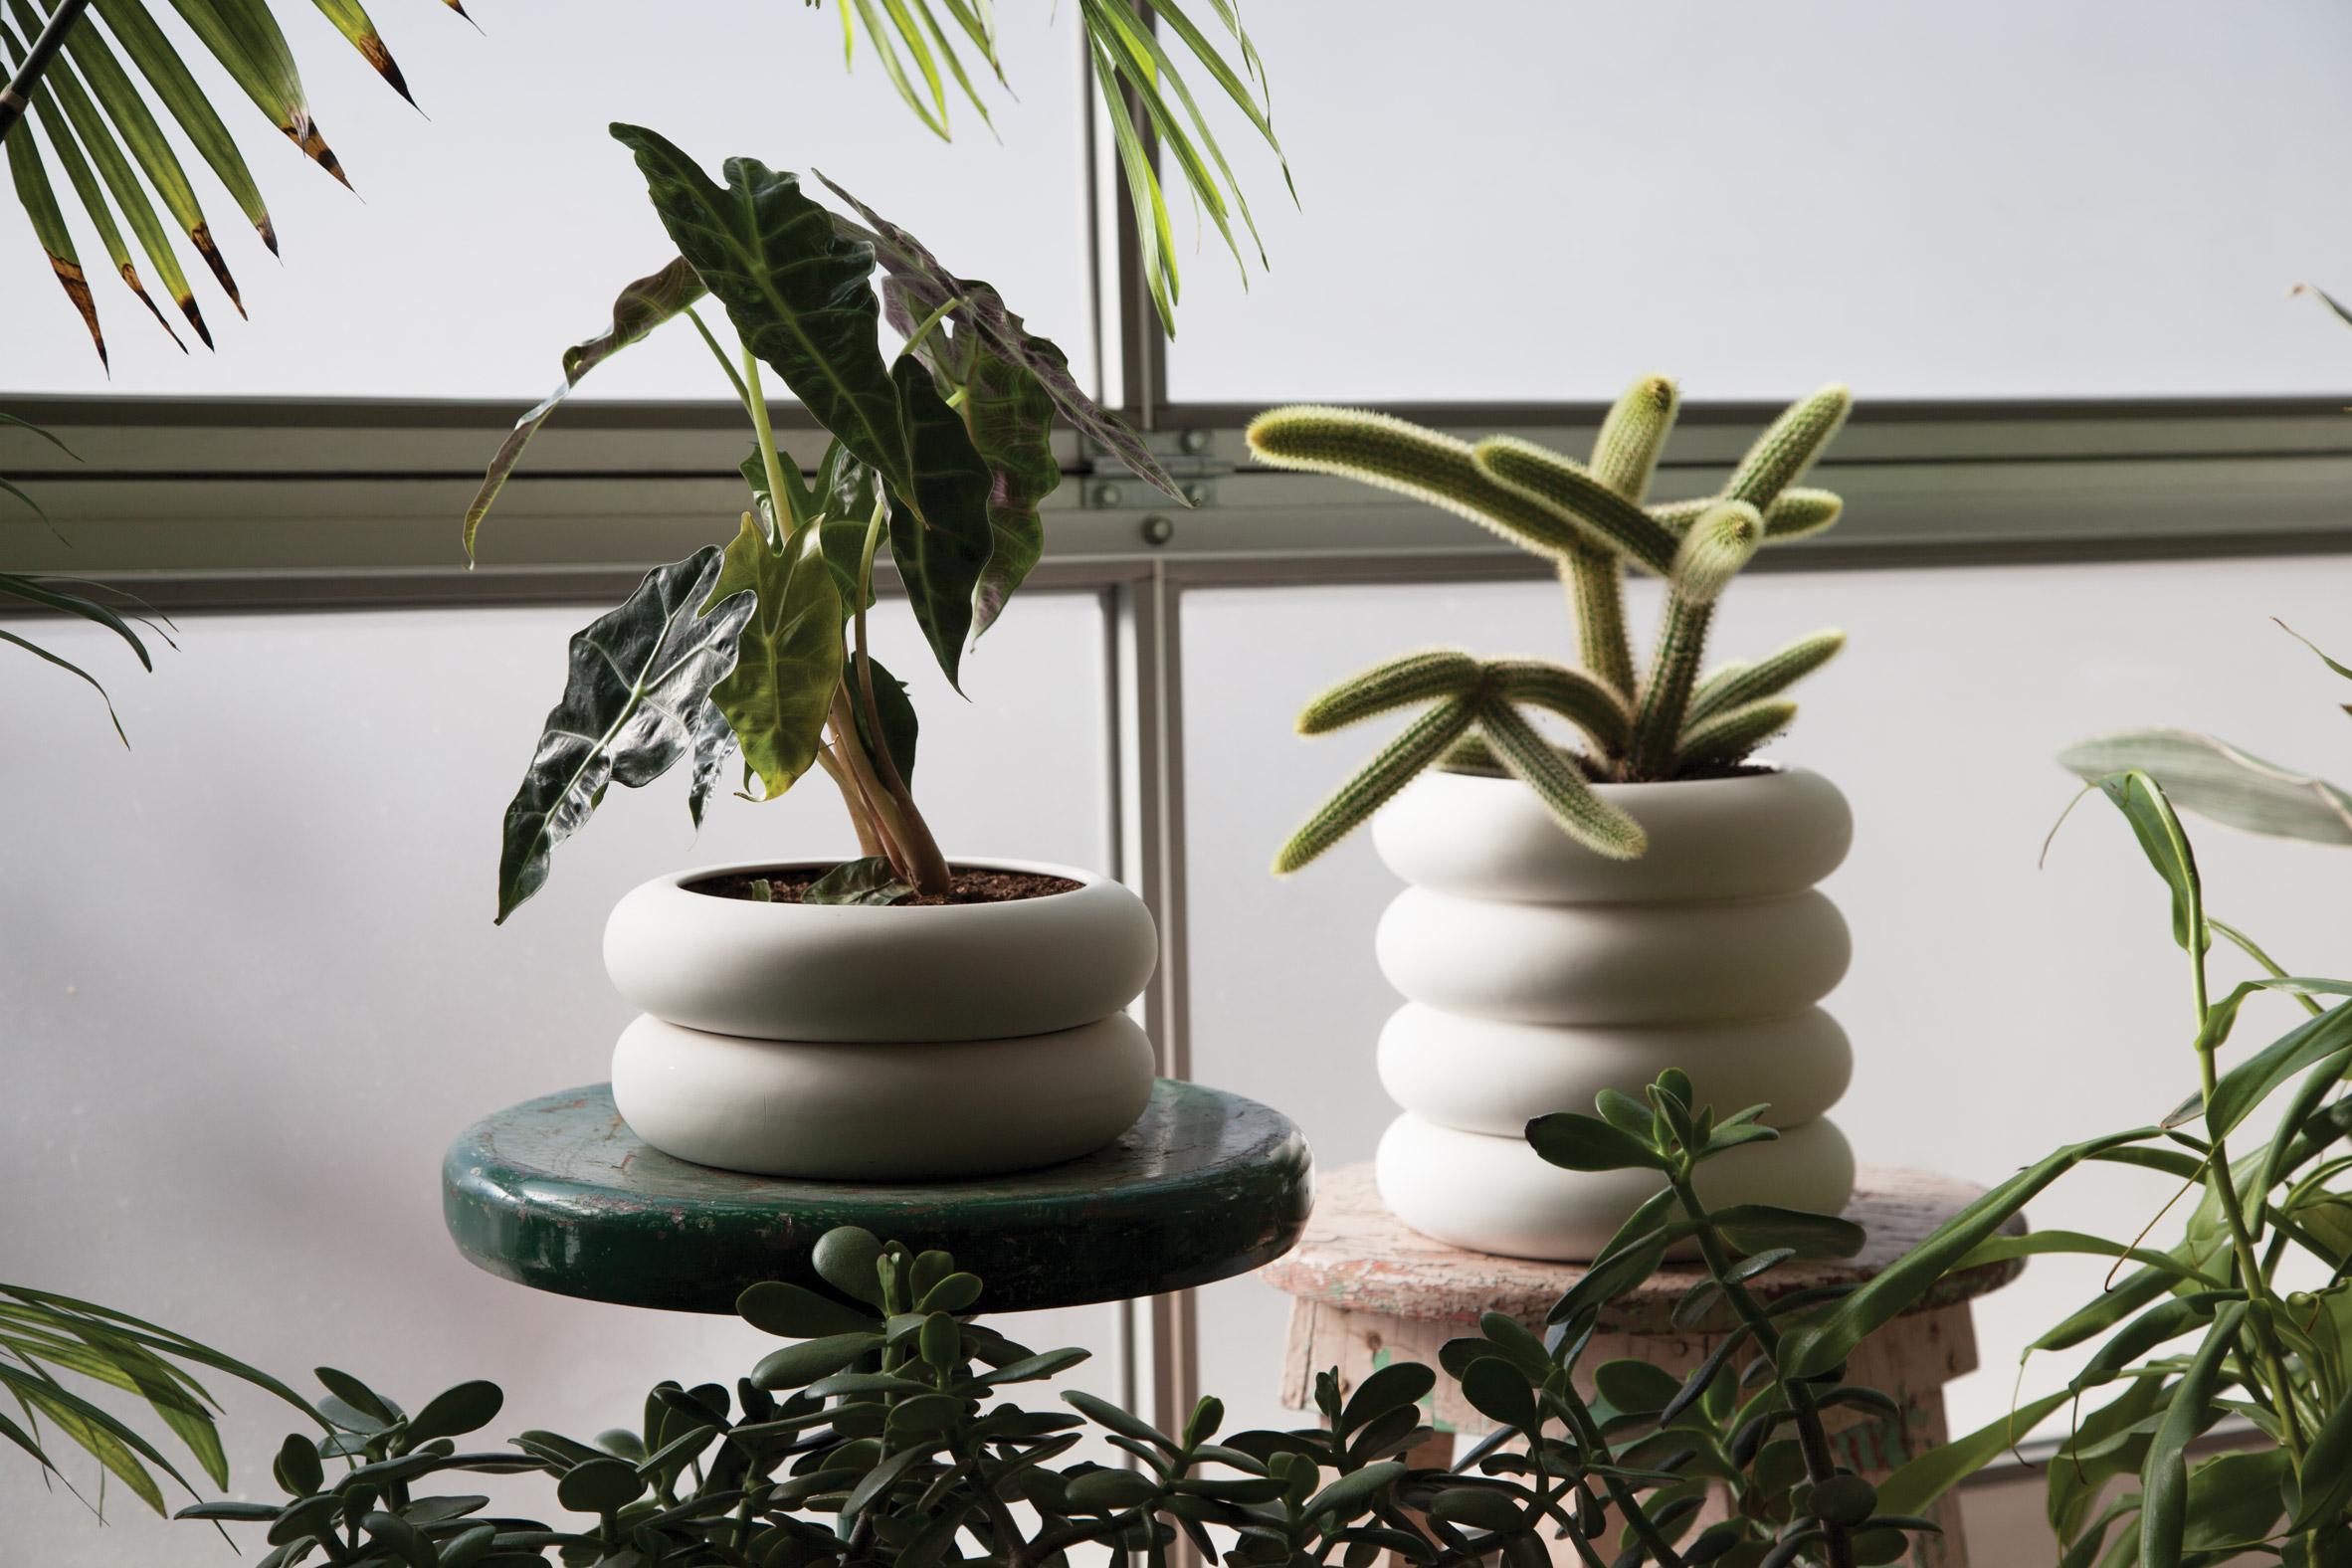 Stacking Planter by Chen Chen & Kai Williams